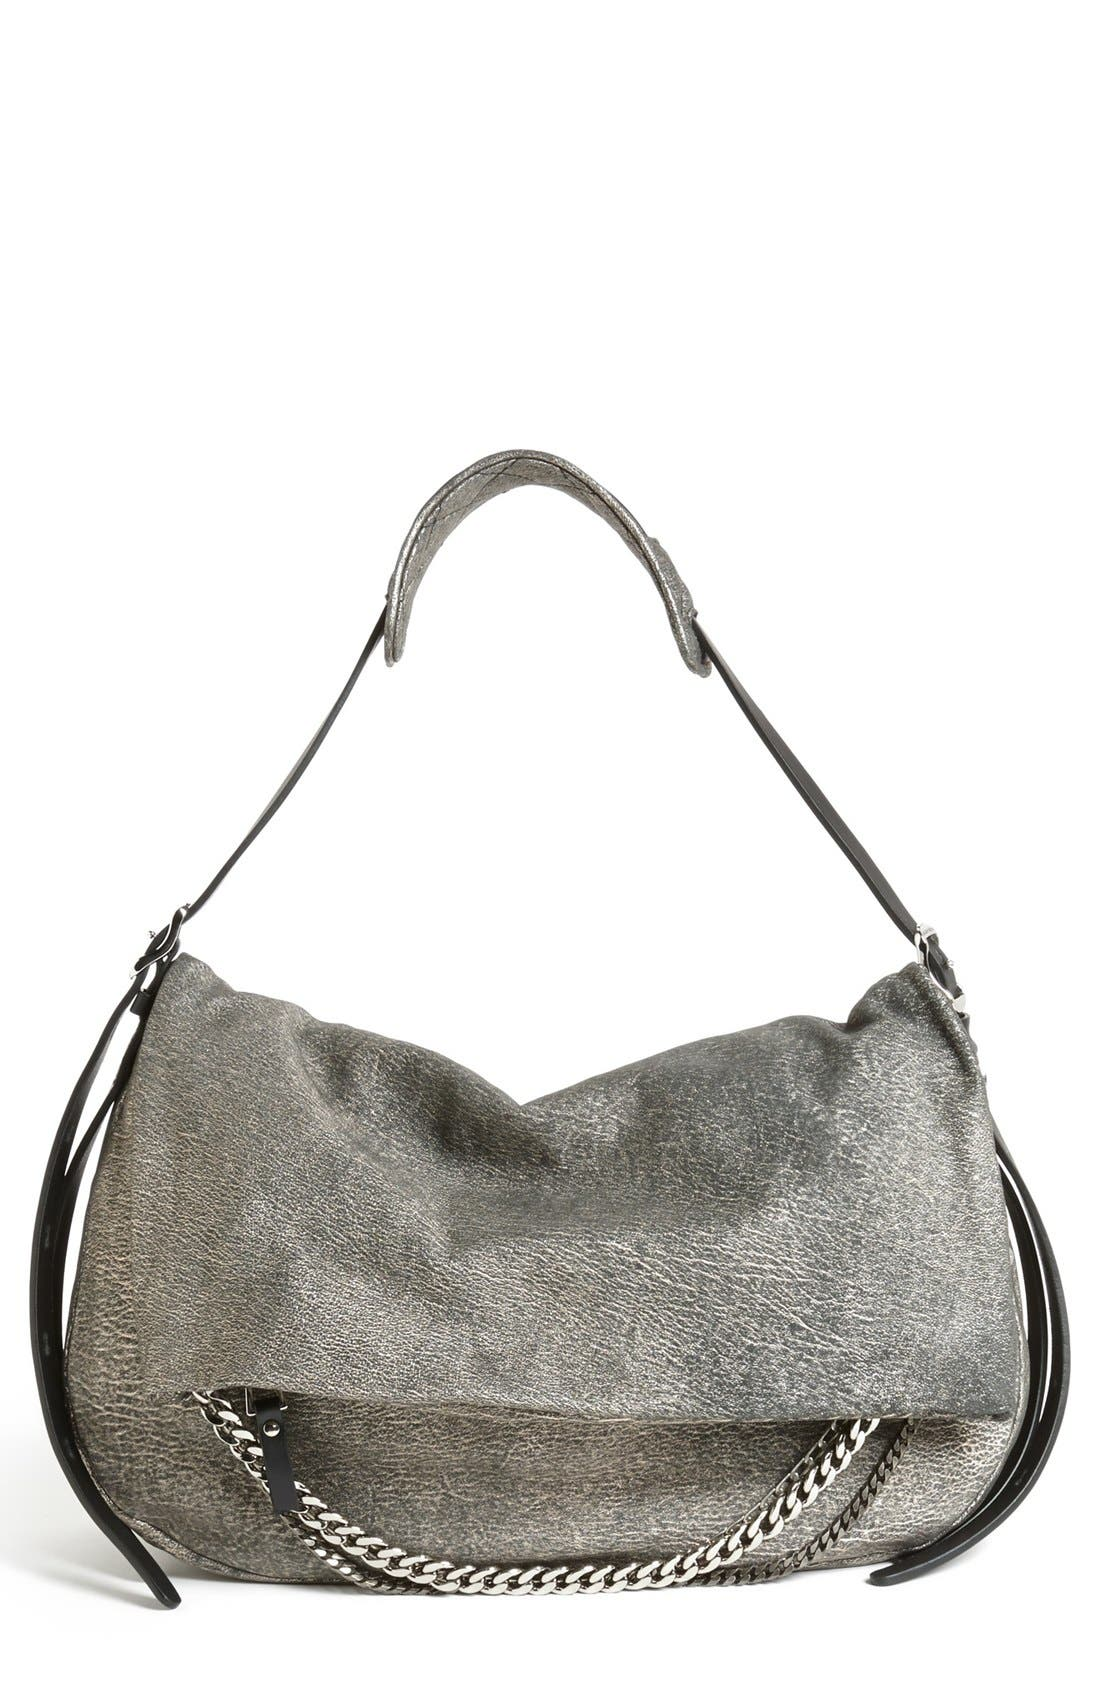 Alternate Image 1 Selected - Jimmy Choo 'Biker - Large' Metallic Suede Shoulder Bag